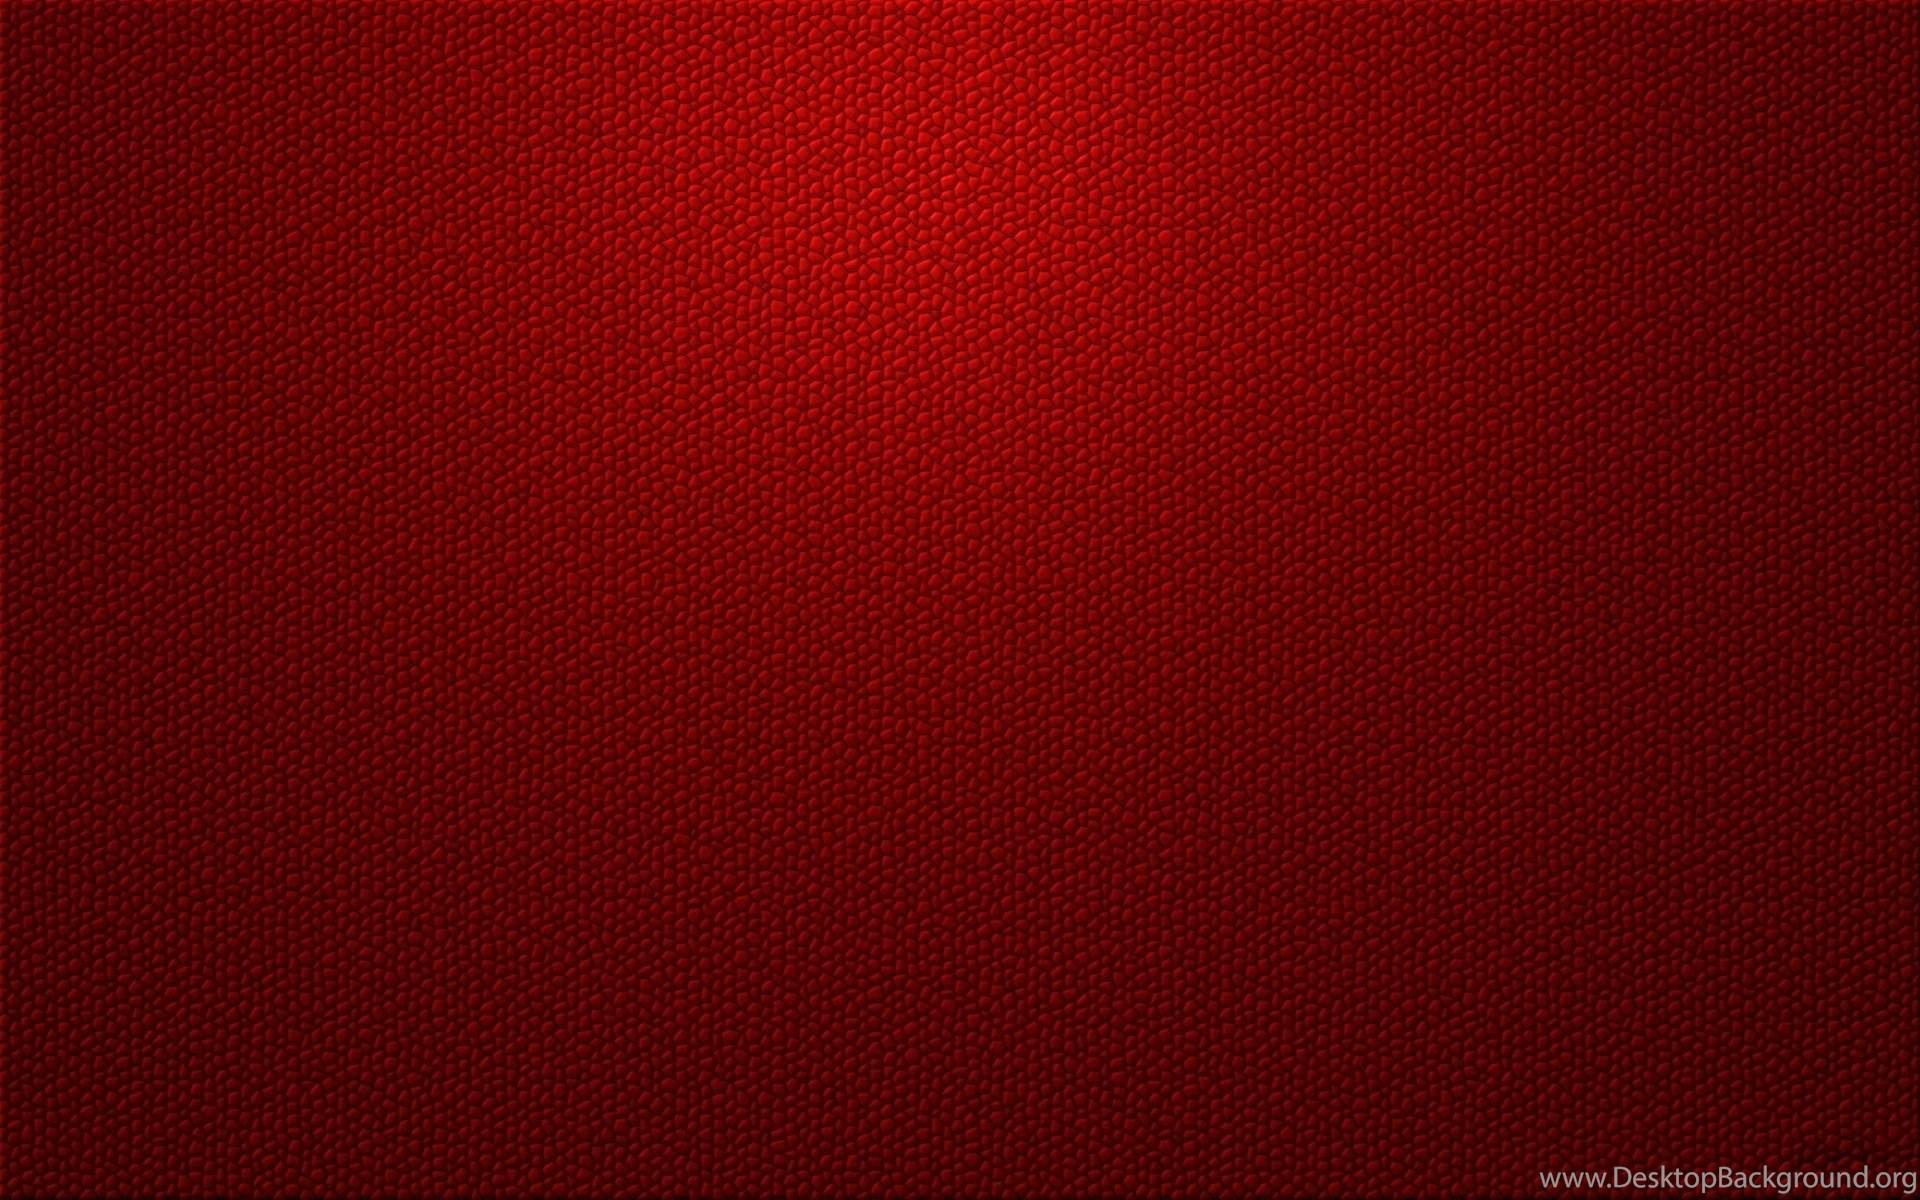 red textured backgrounds hd wallpapers 773327 desktop background red textured backgrounds hd wallpapers